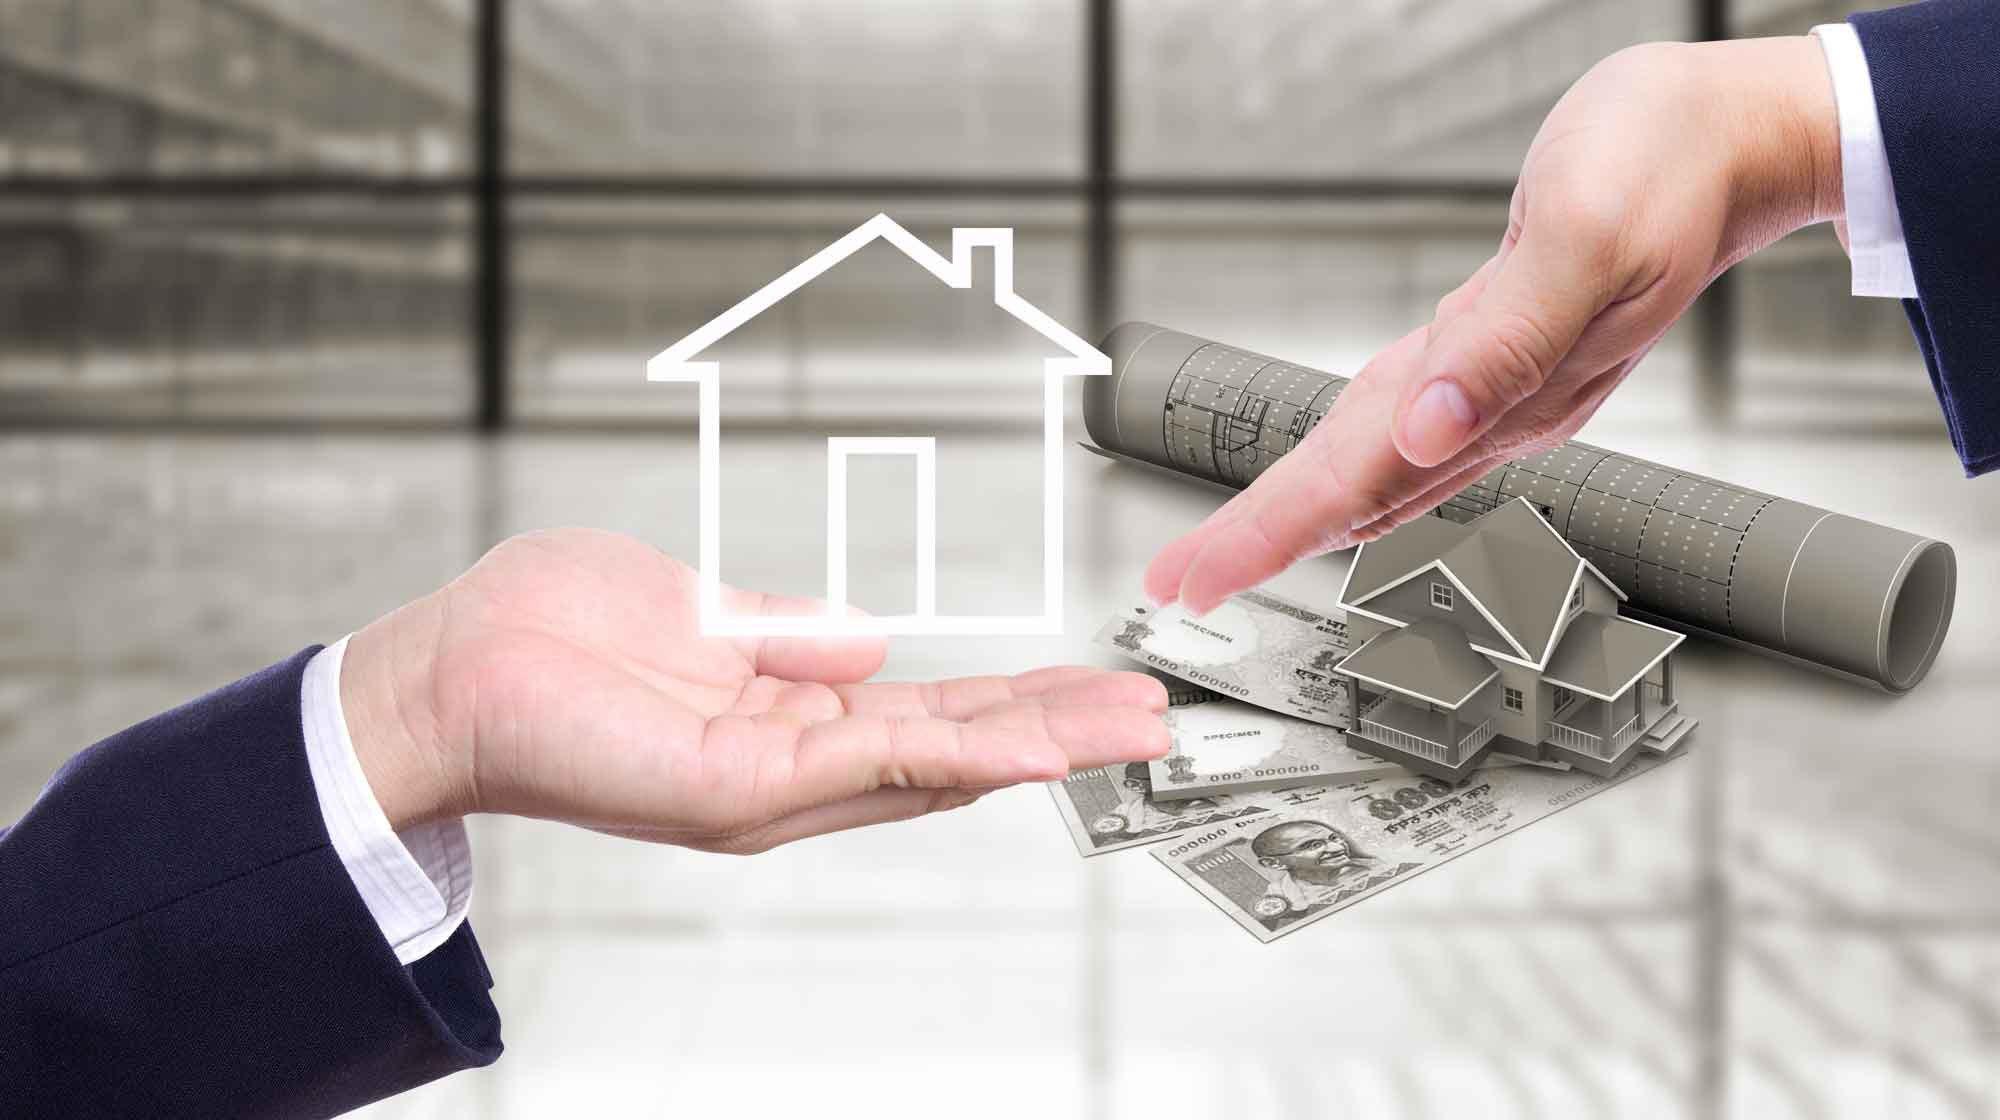 48 Ay Vadeli İhtiyaç Kredisi Veren Bankalar